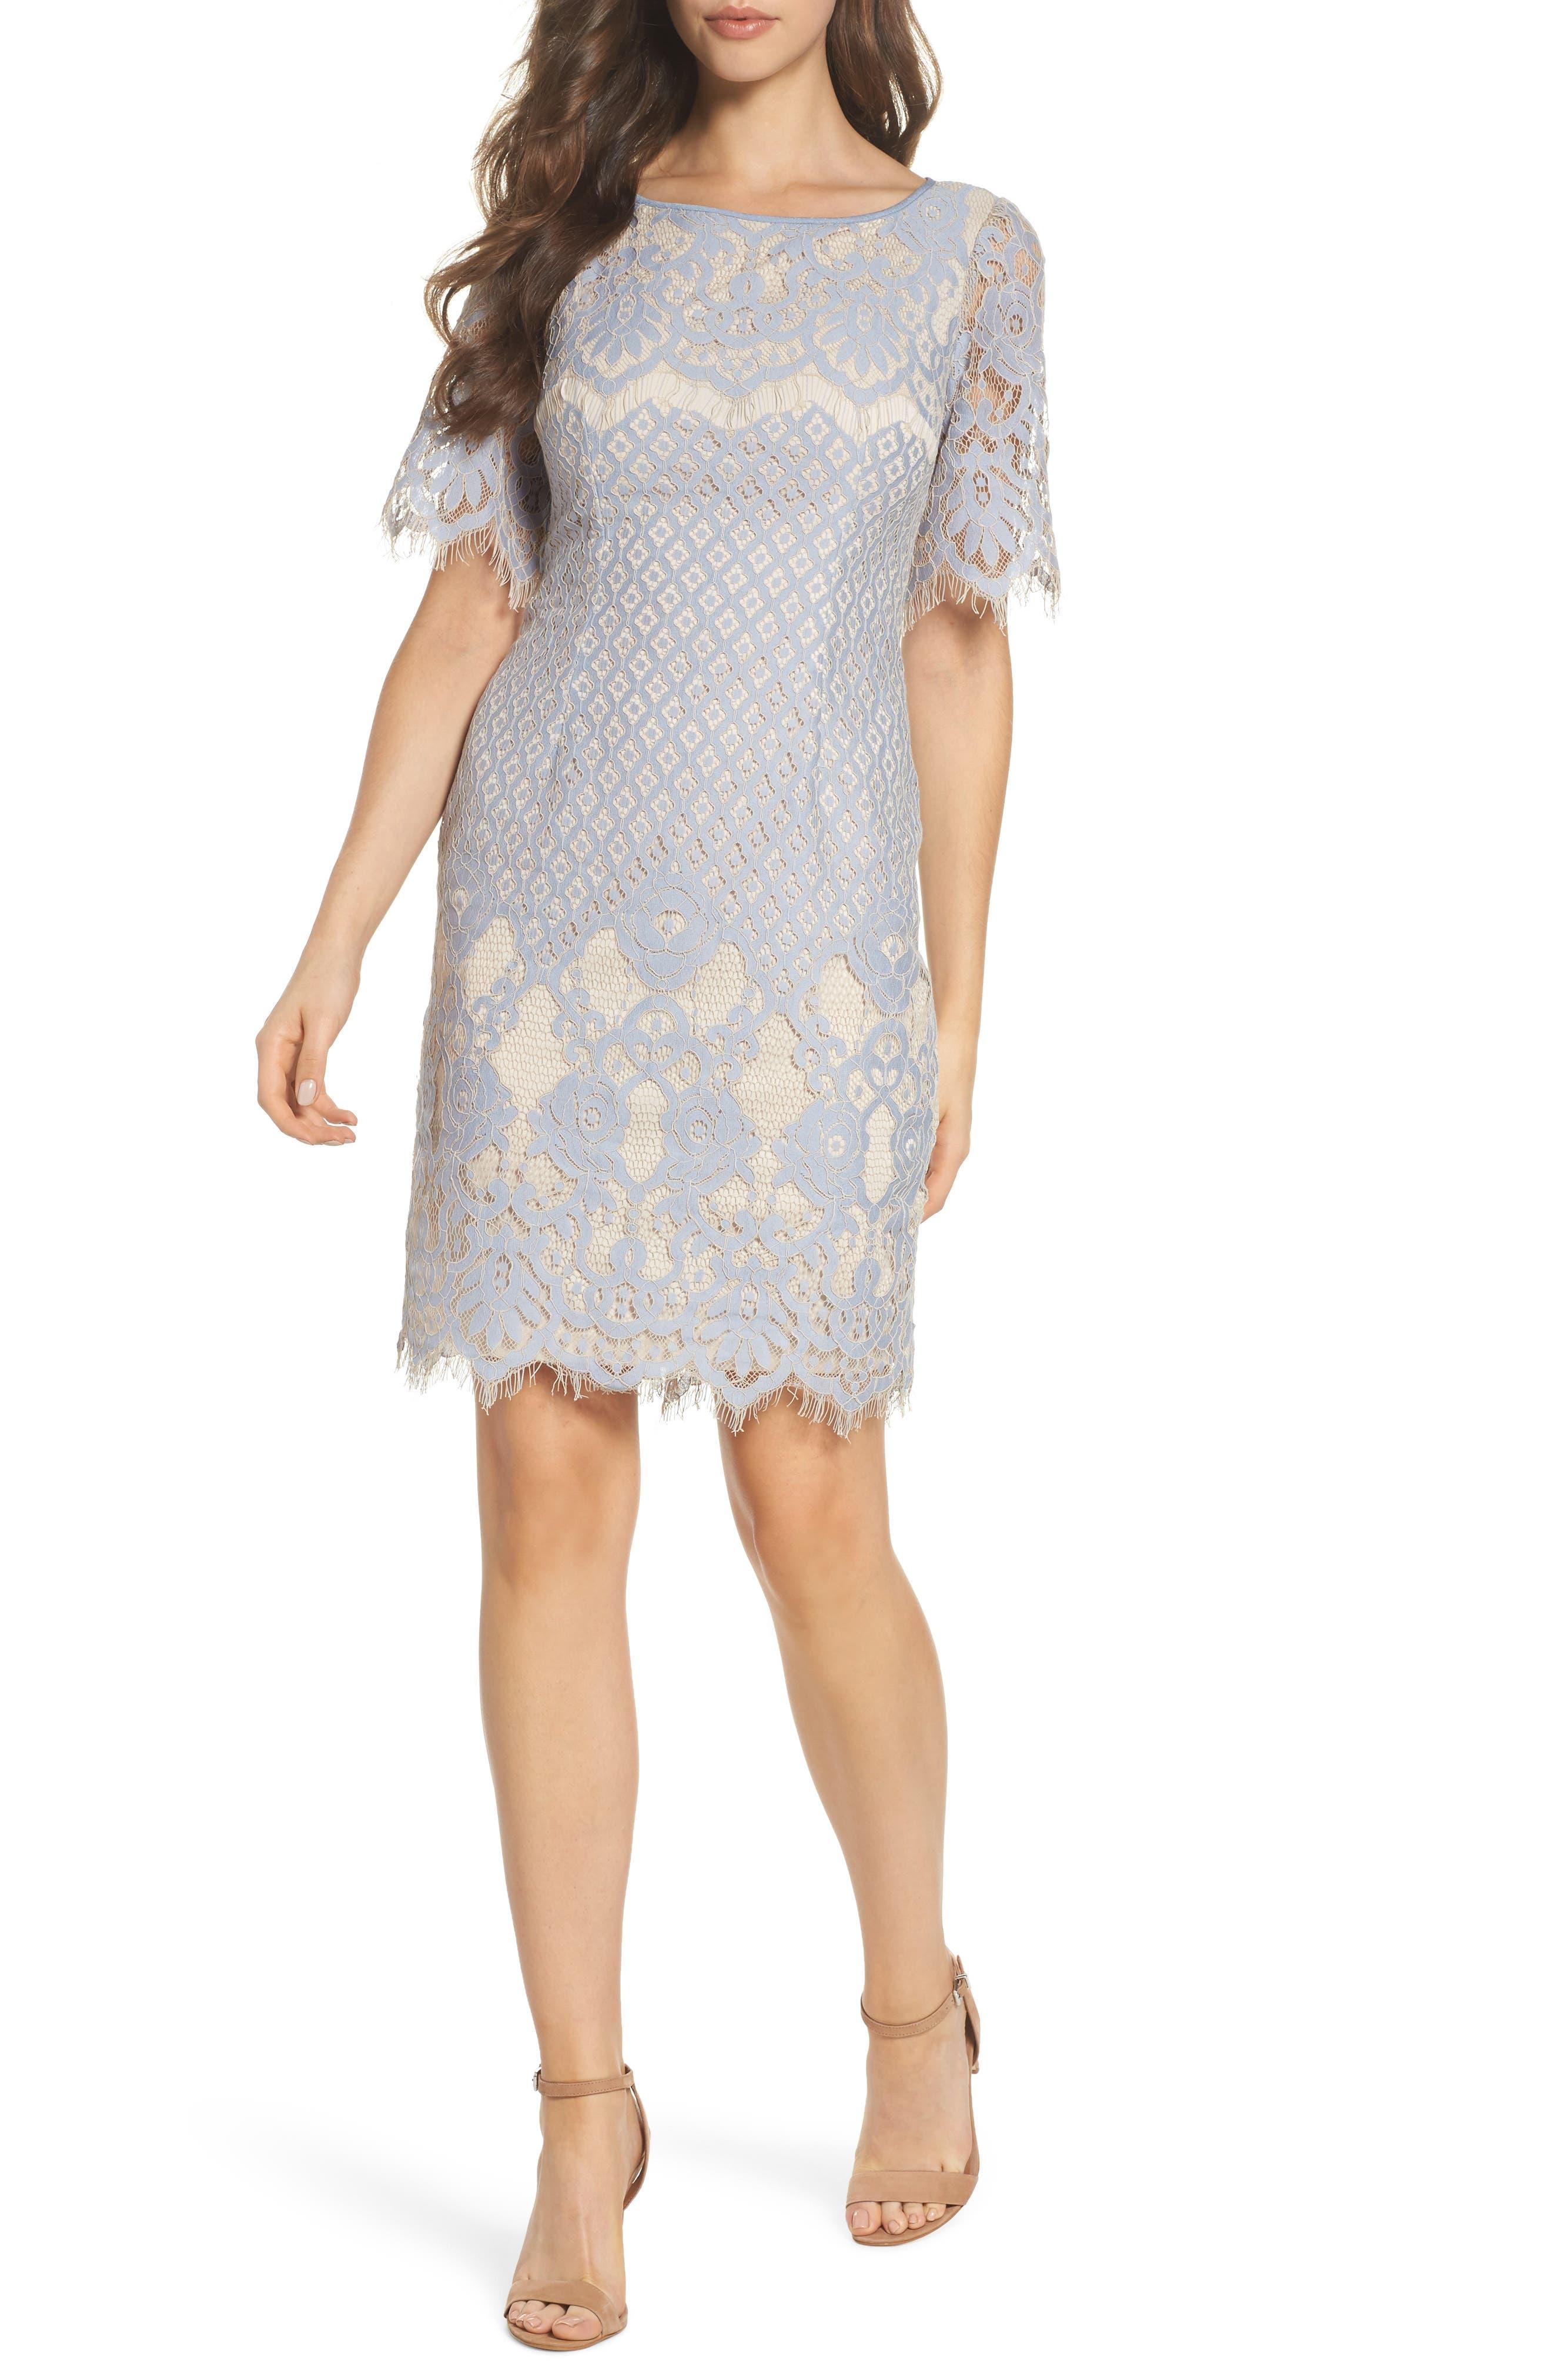 Alternate Image 1 Selected - Adrianna Papell Georgia Lace Sheath Dress (Regular & Petite)